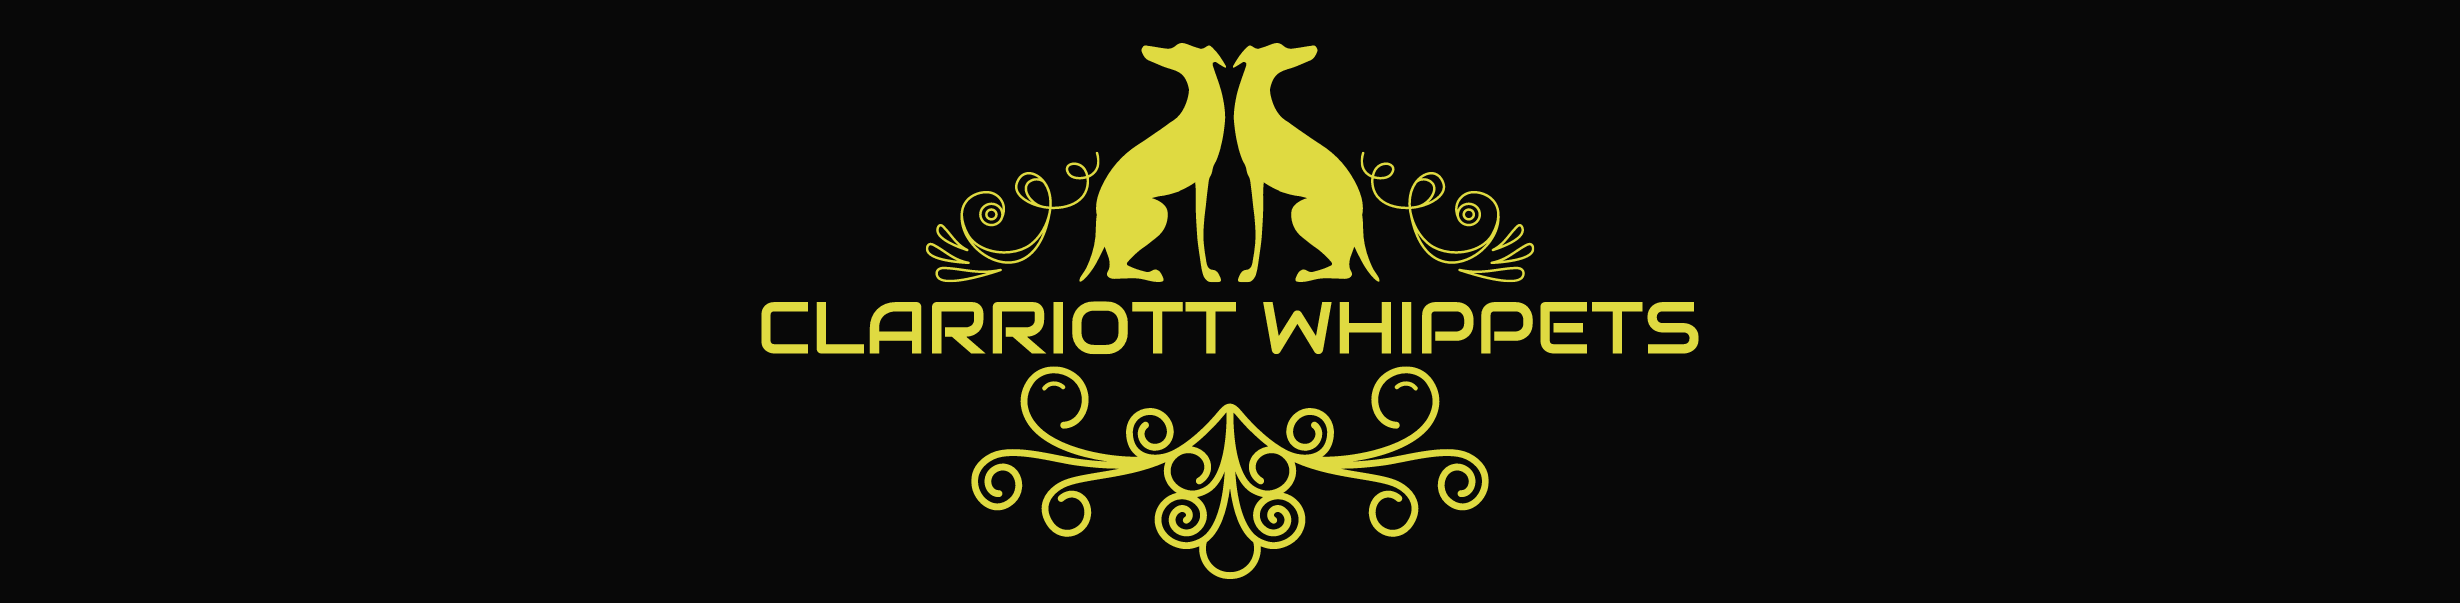 Clarriott Whippets